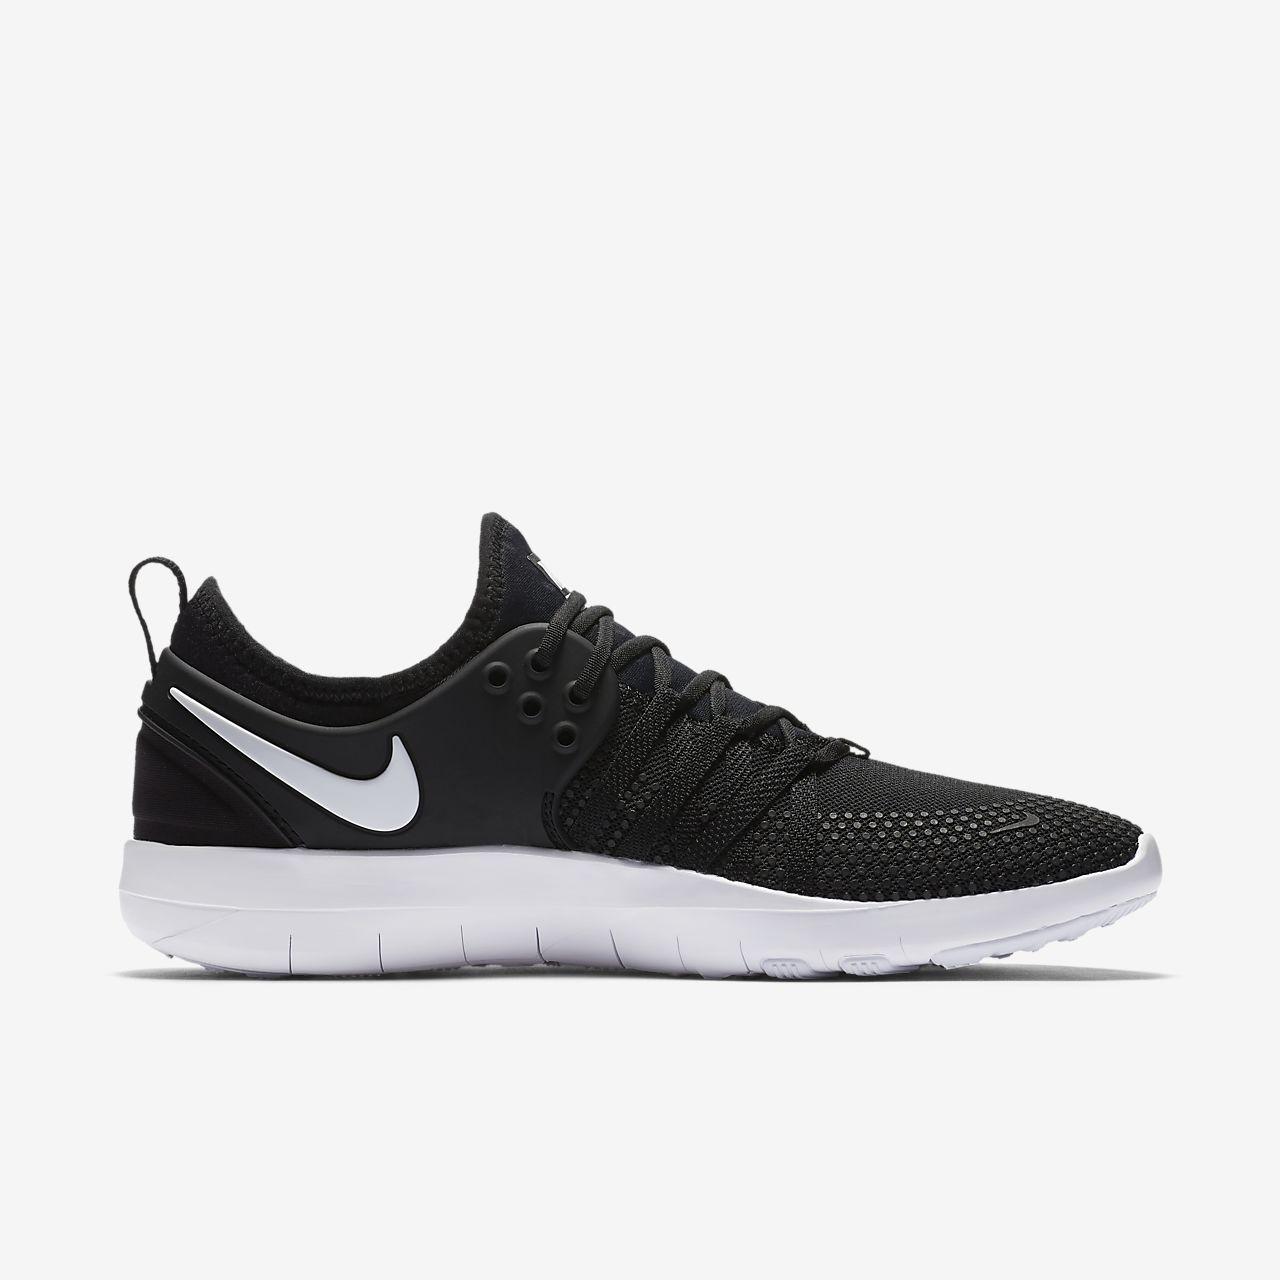 promo code 27806 6f105 Nike Free TR 7 Women's Training Shoe